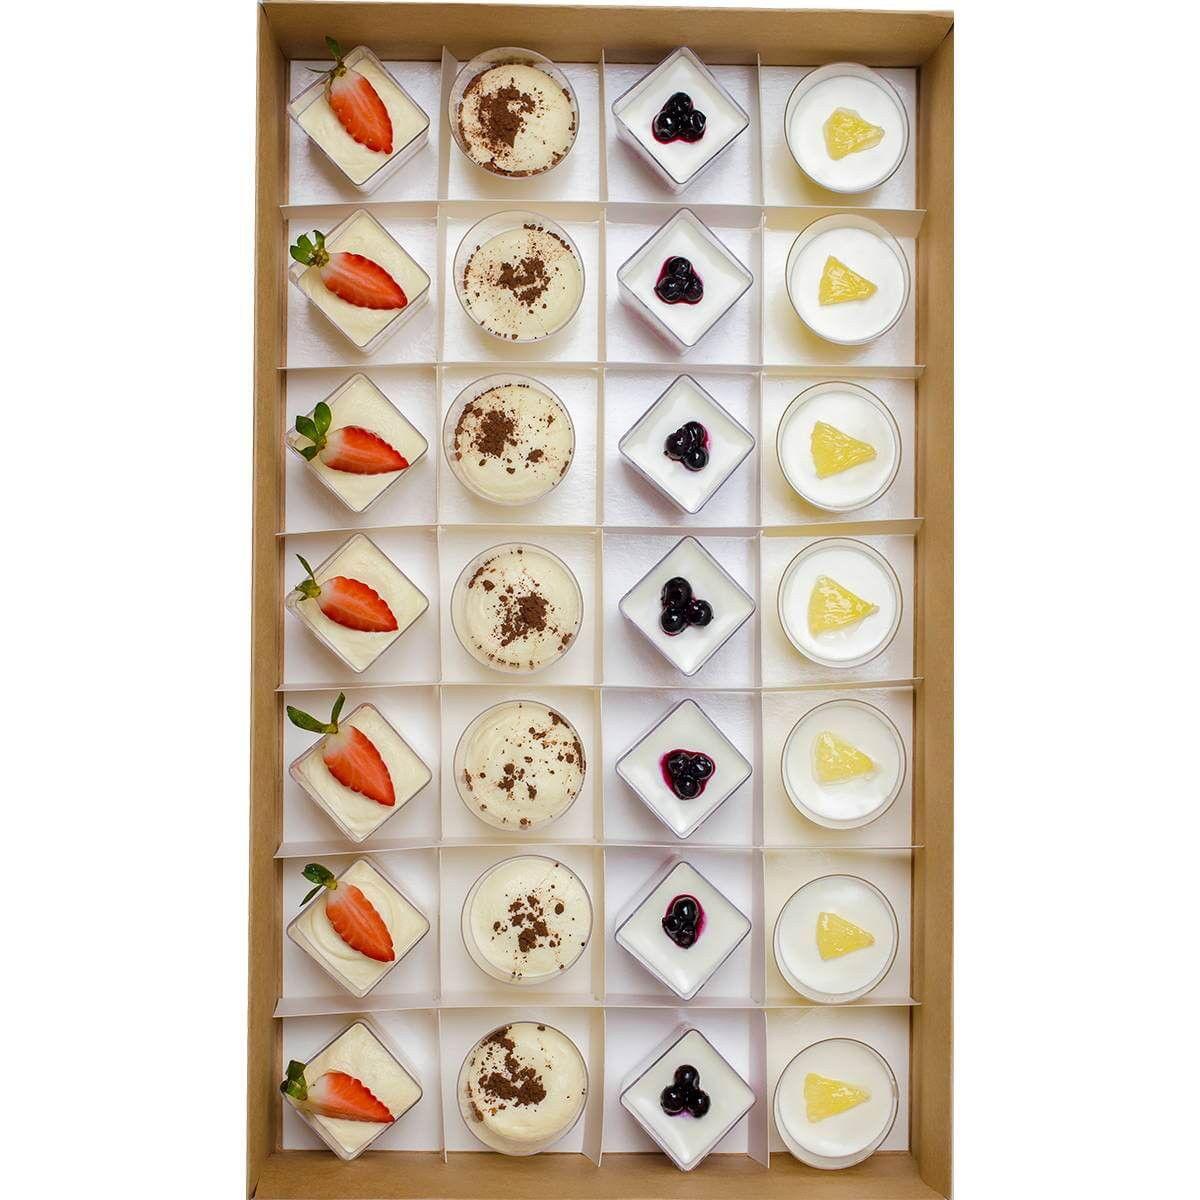 Dessert big box: 1 299 грн. фото 1